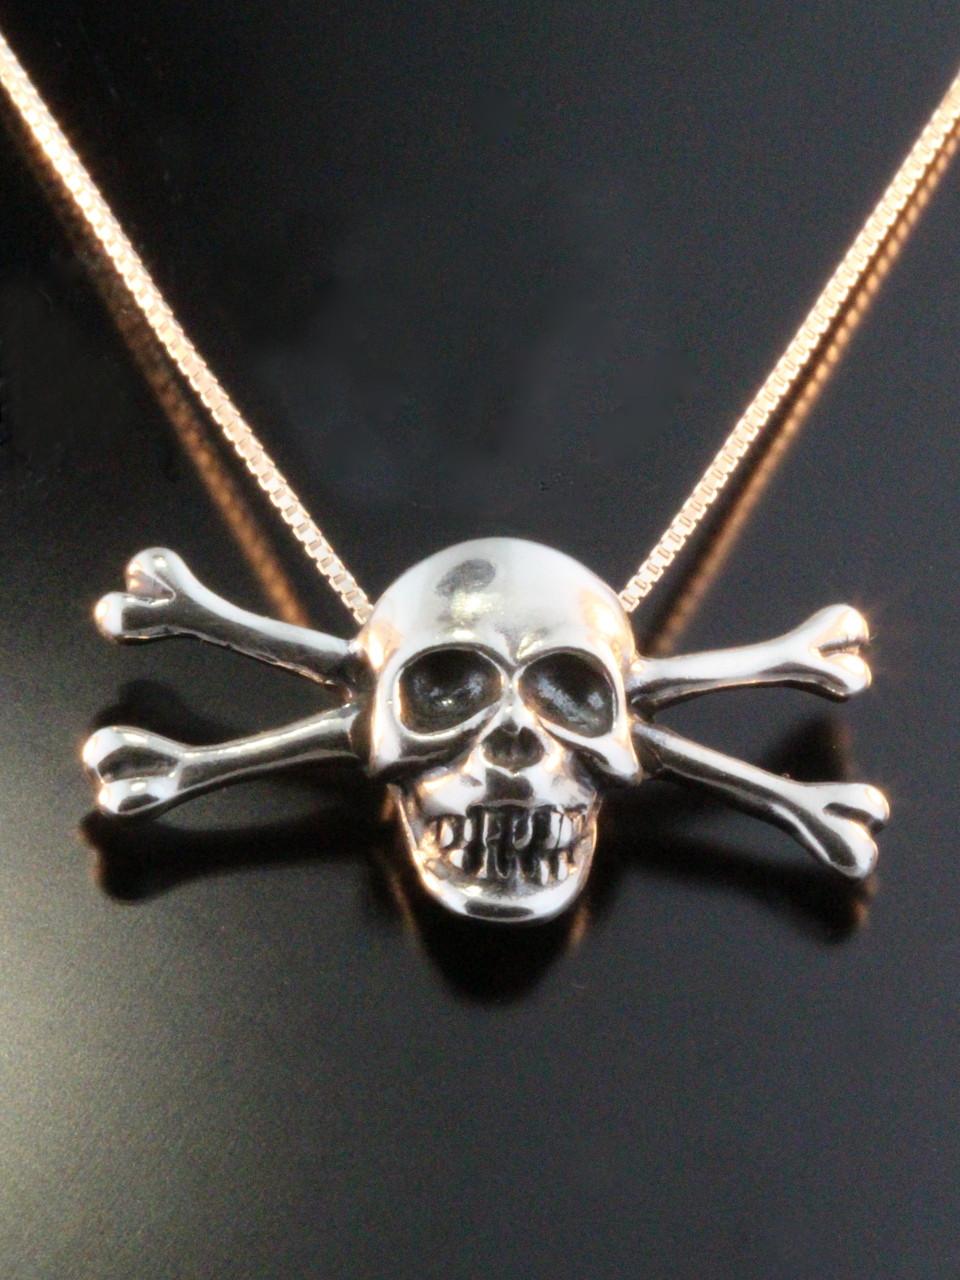 Pirate skull and crossbone pendant jewelry pirate skull and crossbone pendant silver aloadofball Gallery